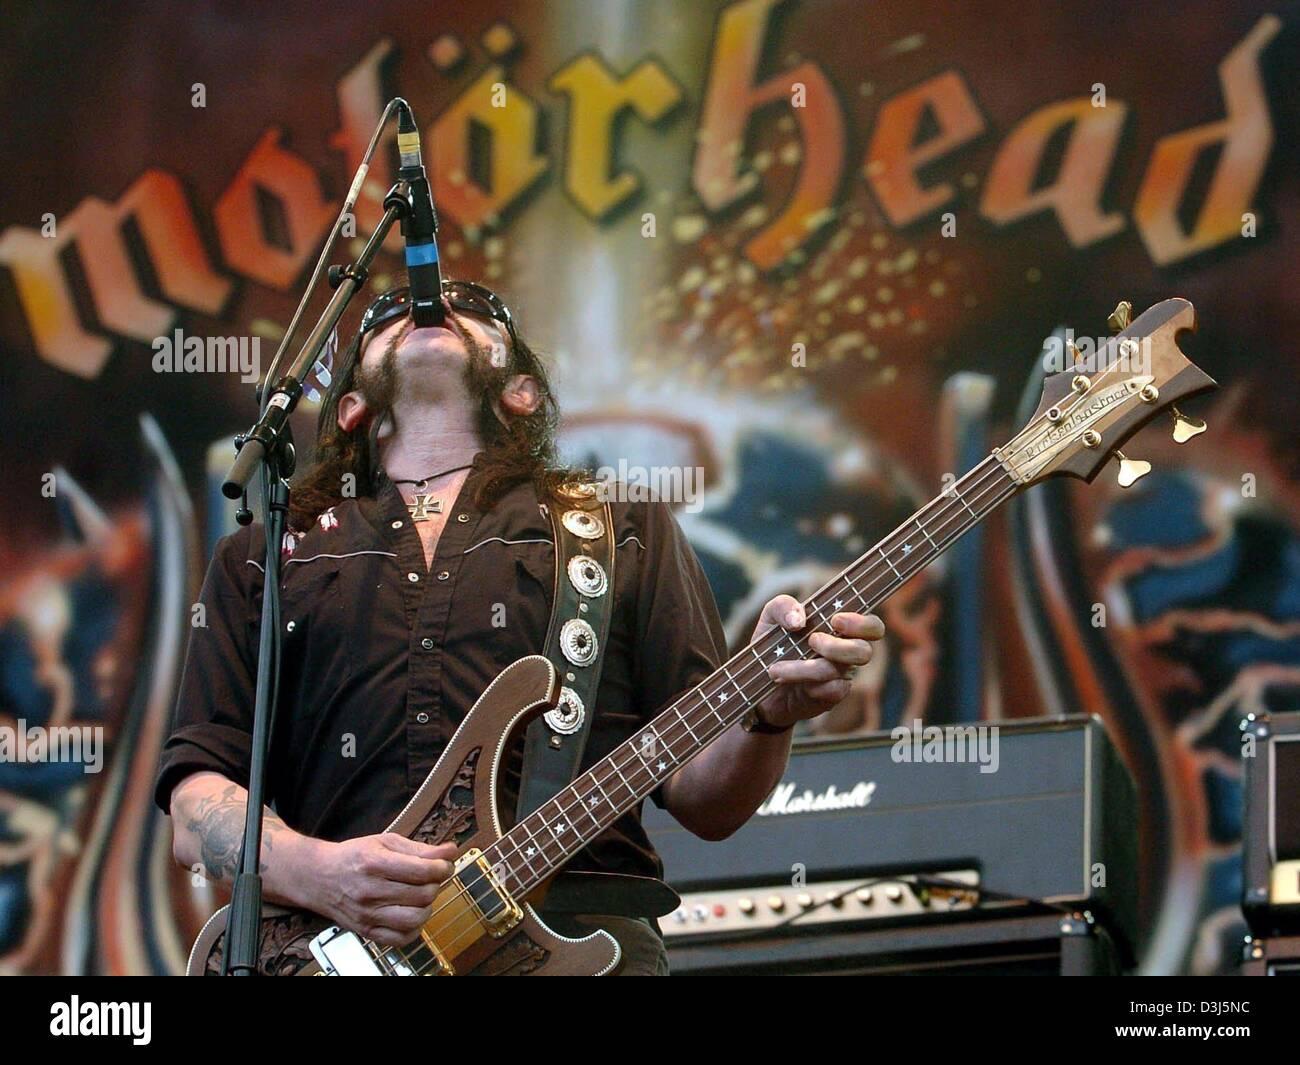 dpa) - Lemmy Kilmister, singer of the English heavy metal